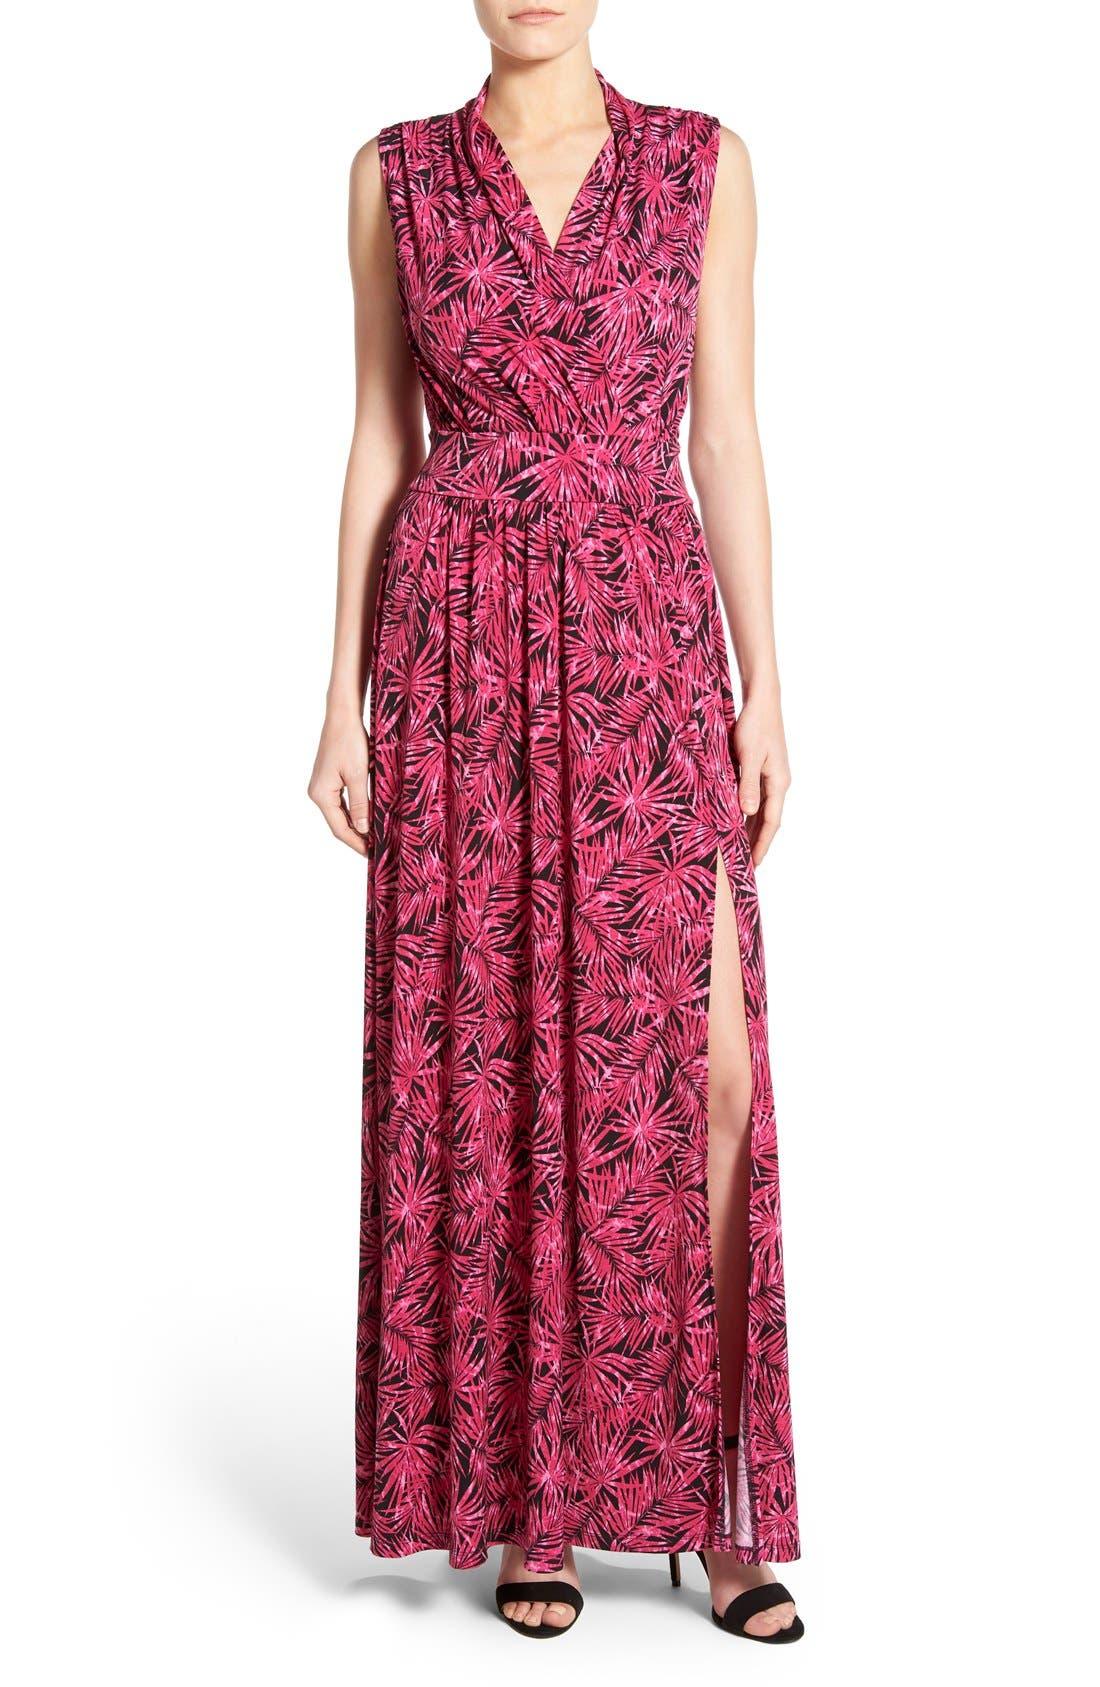 Alternate Image 1 Selected - MICHAEL Michael Kors Print Jersey Side Slit Maxi Dress